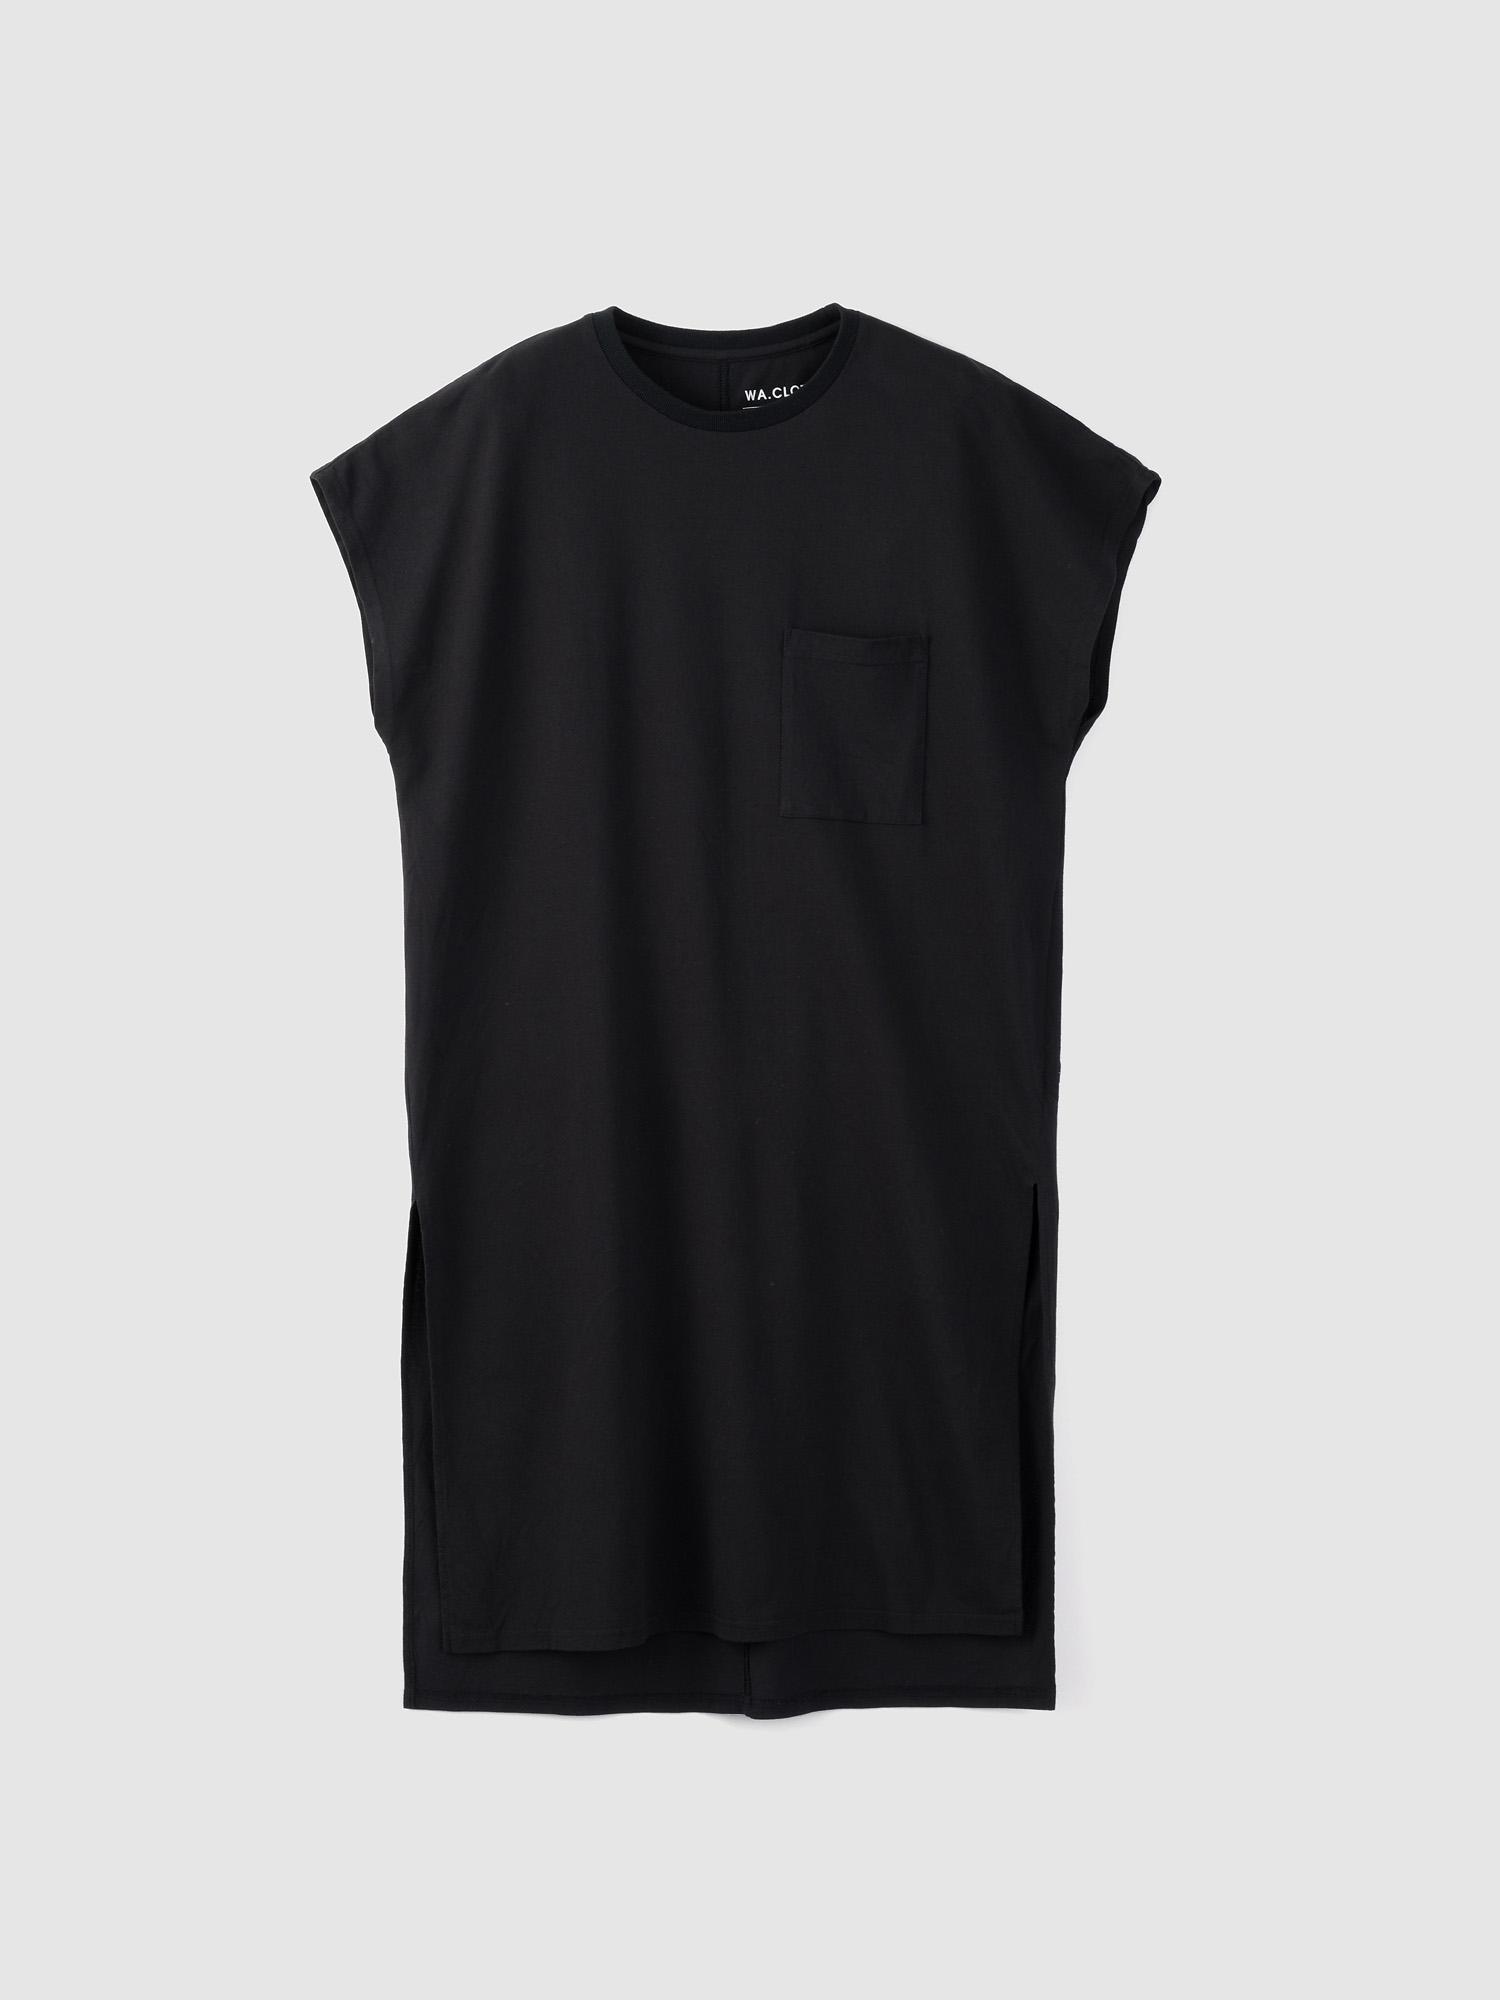 Women's COMFORT DRESS TUNIC T-SHIRTのサムネイル0